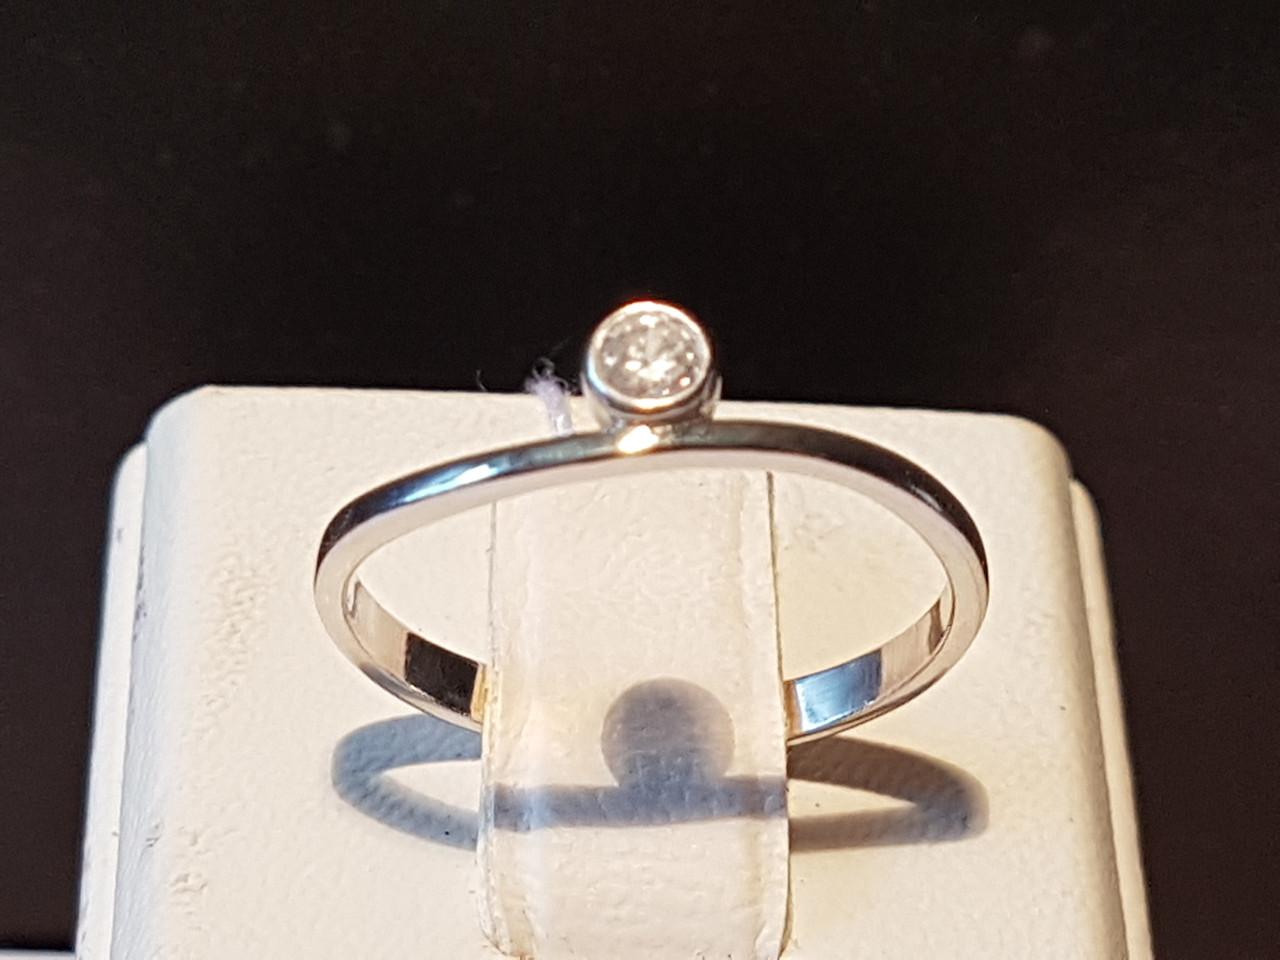 Серебряное кольцо с фианитами. Артикул 10020р